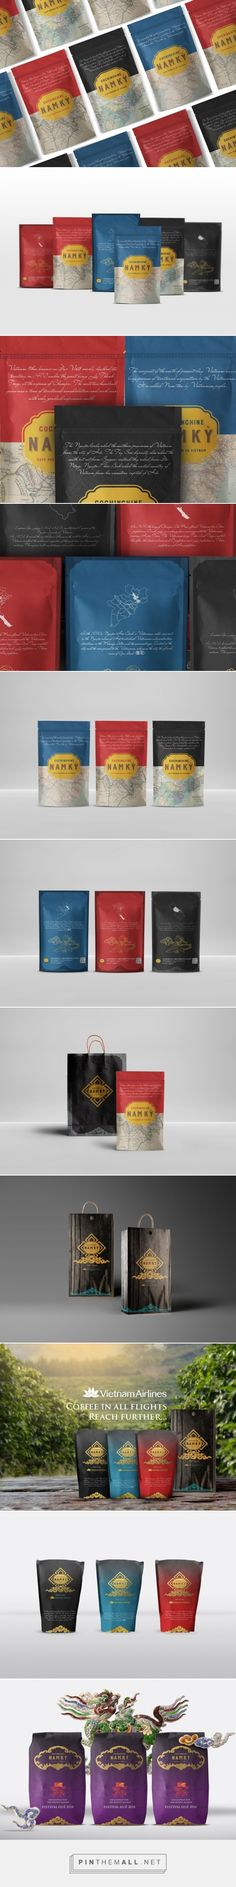 Nam Kỳ Roastery Coffee Packaging Design Concept by Gongvo Creative (Vietnam) - http://www.packagingoftheworld.com/2016/05/nam-ky-roastery-concept.html